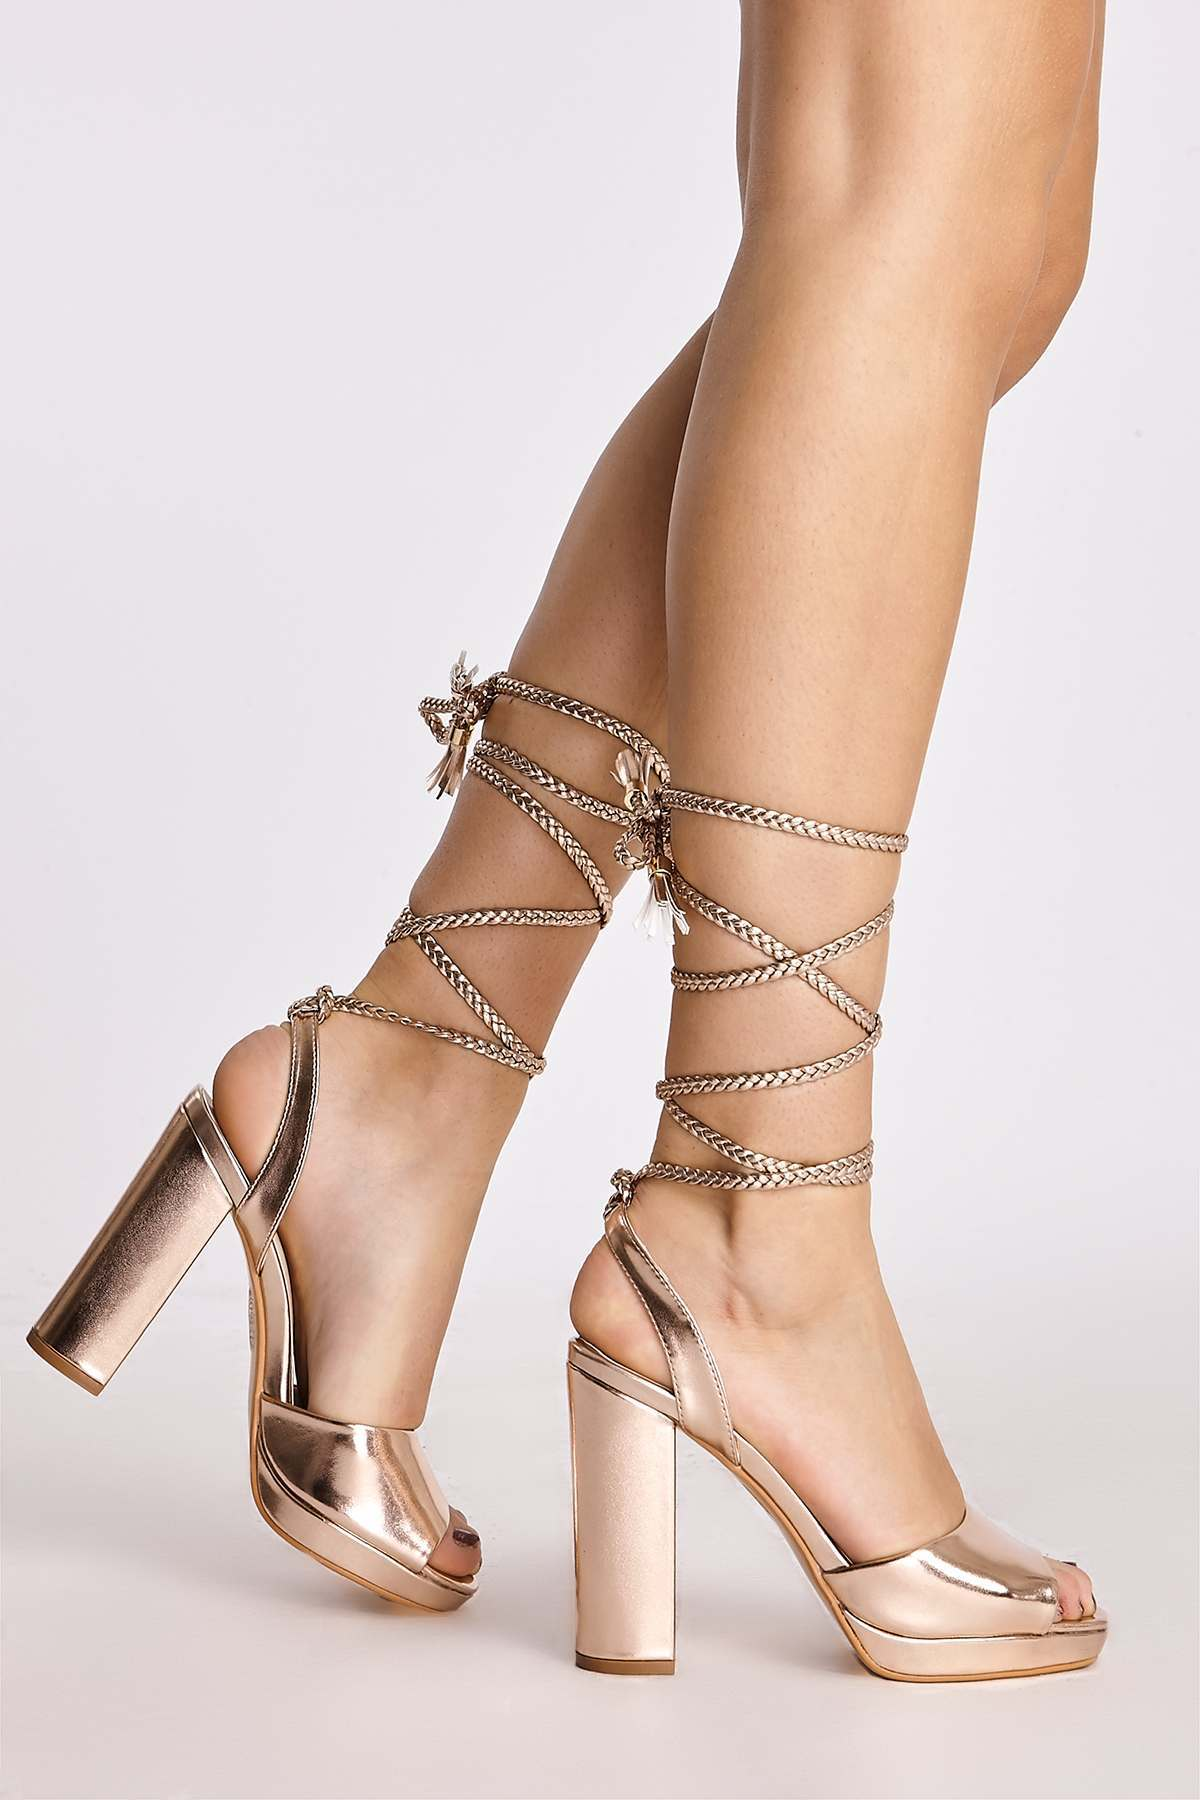 Heels  Alecia Rose Gold Plaited Tie Leg Heels